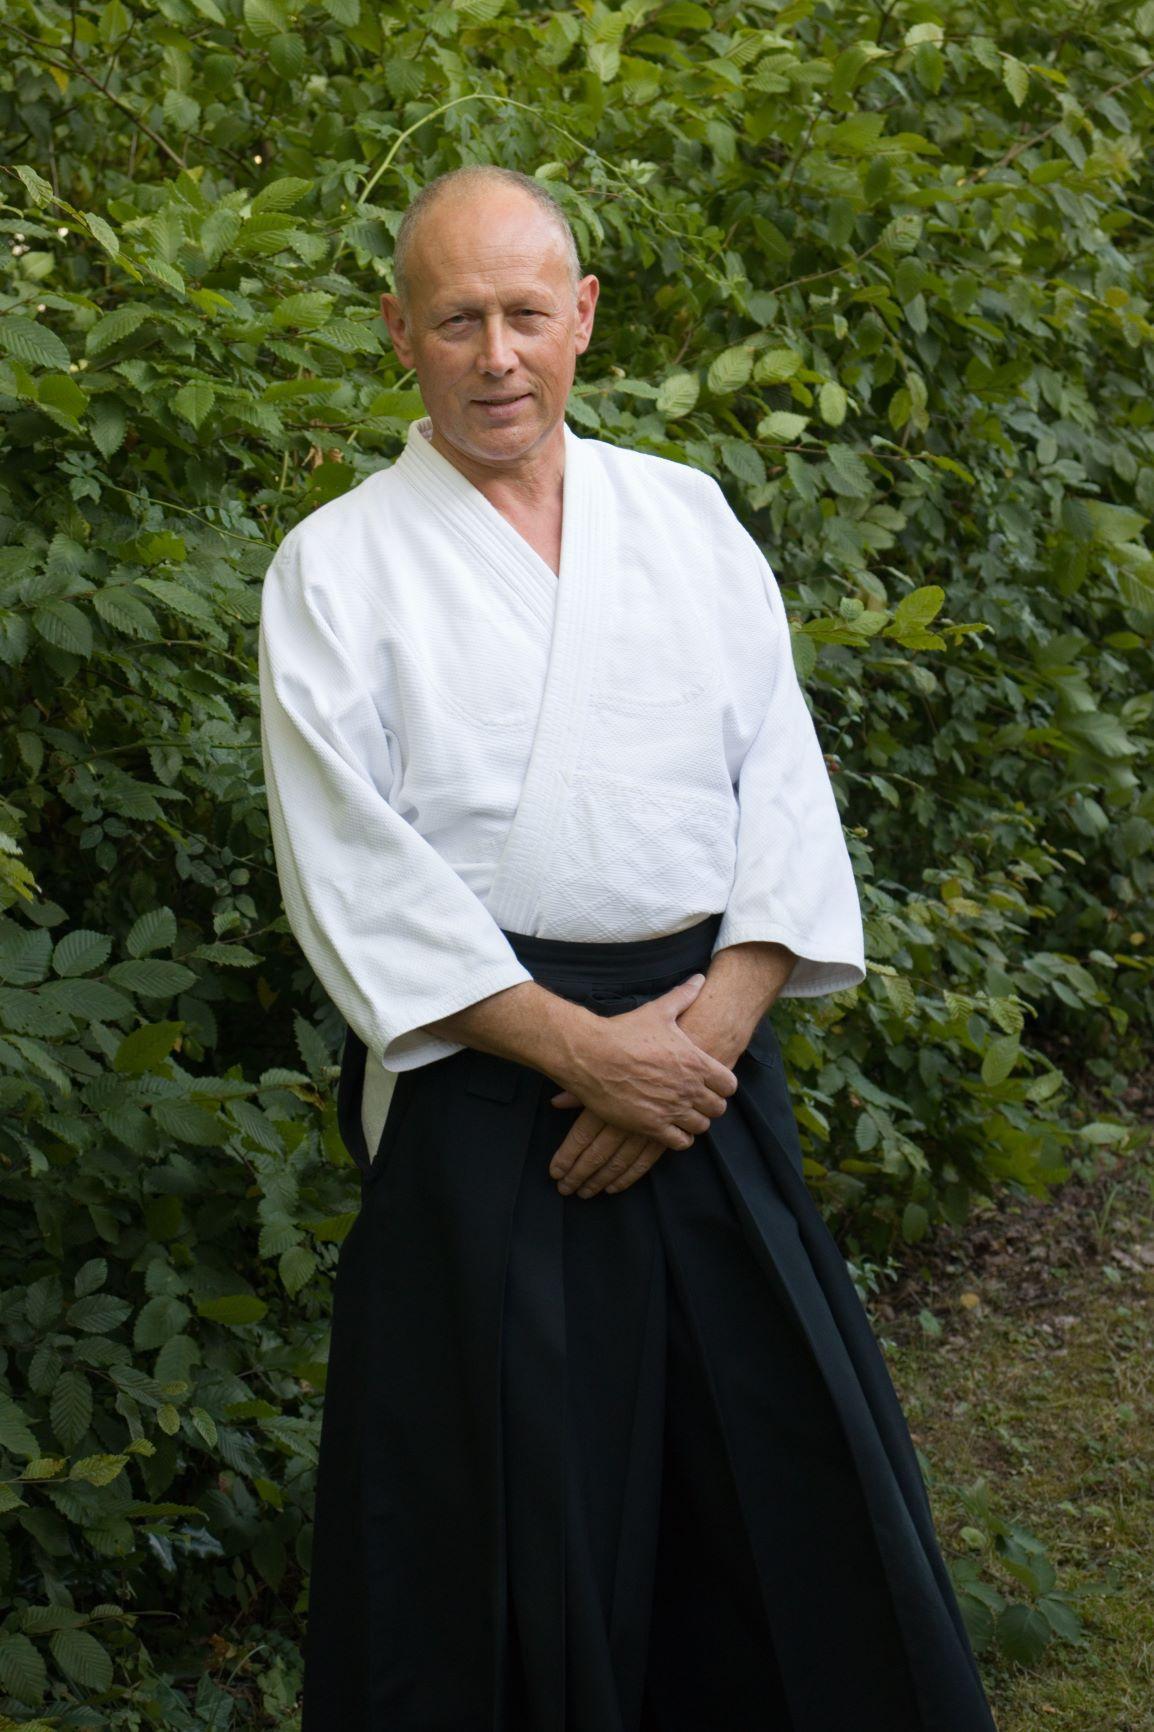 Gerald Renfer